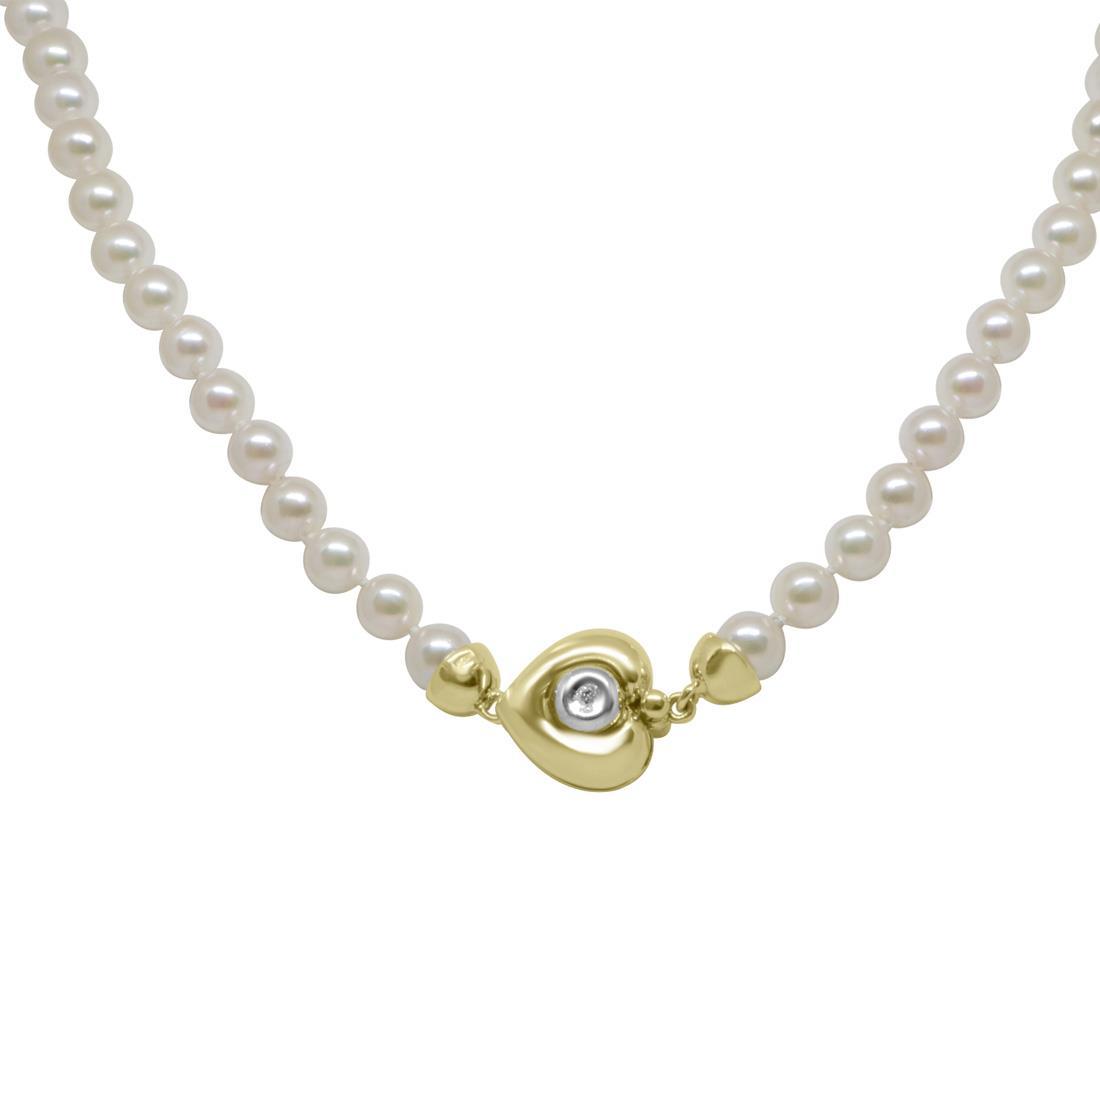 Collana Oro & Co con perle Akoya Giapponesi 5.5-6MM - ORO&CO